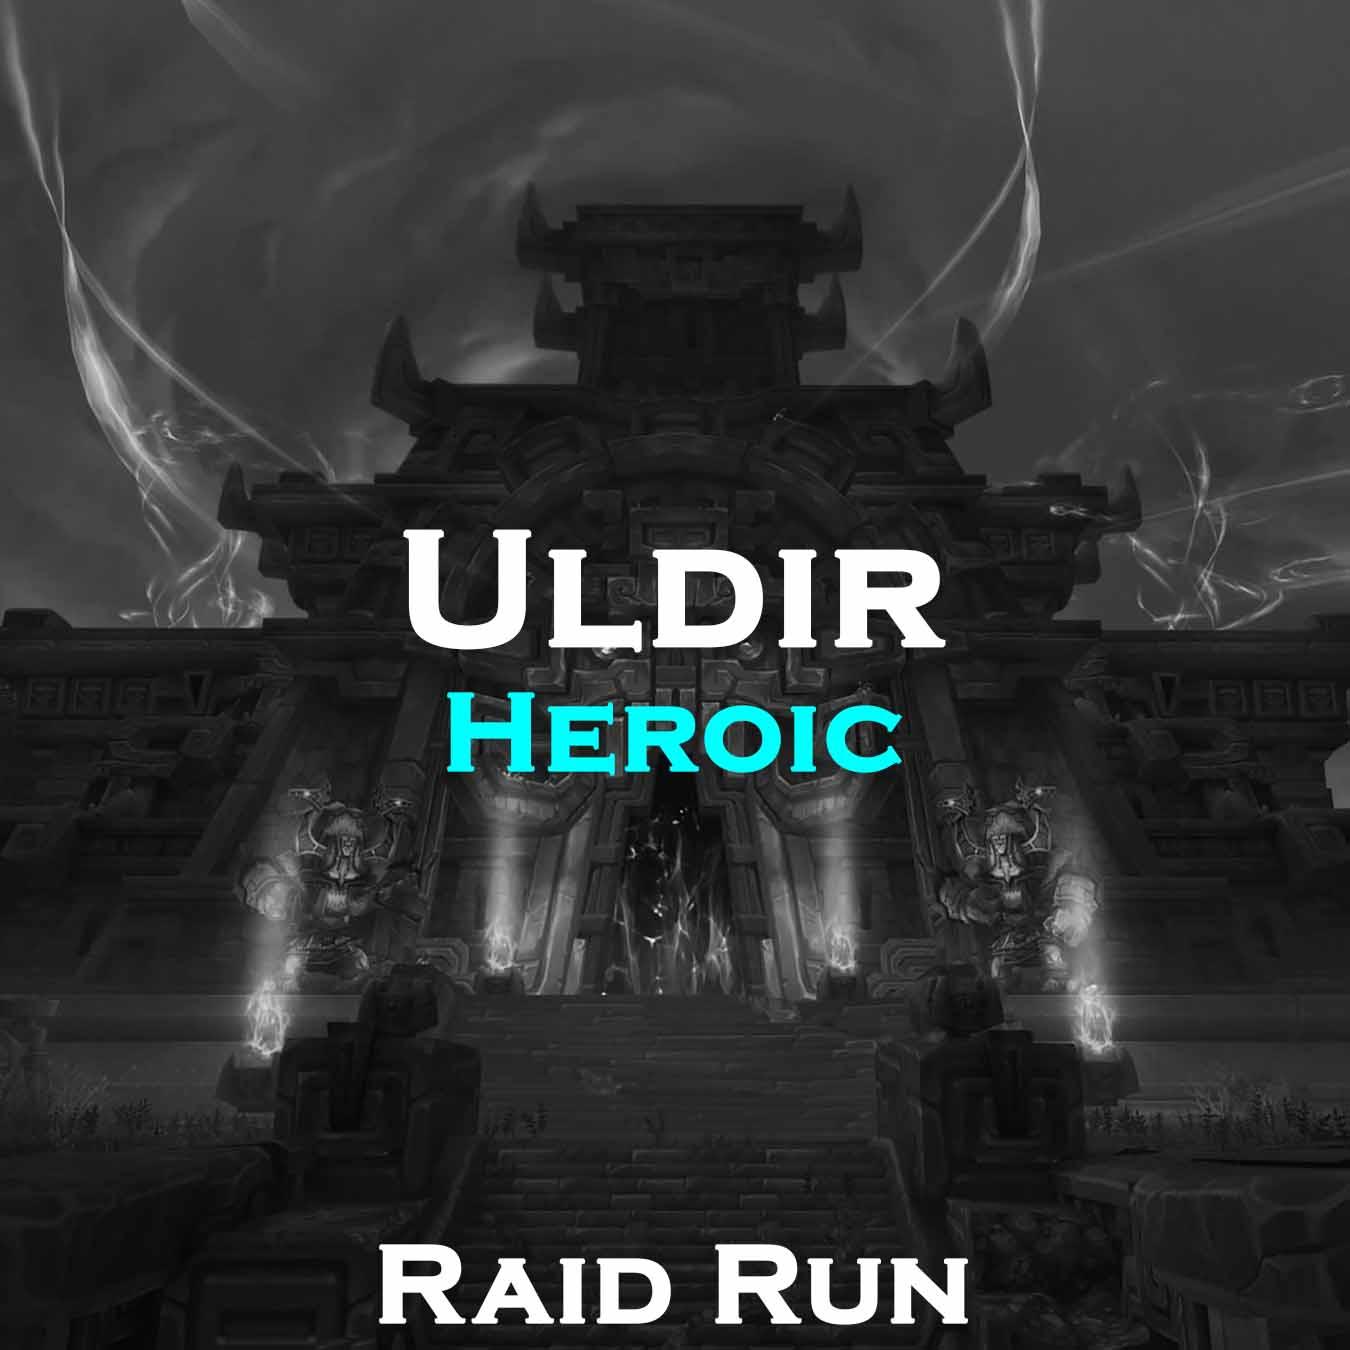 Uldir Heroic Raid Run | 8/8 Full Run | 370 iLvl Loot | NO ACCOUNT SHARING | Guild WoW Boost | ARMADA